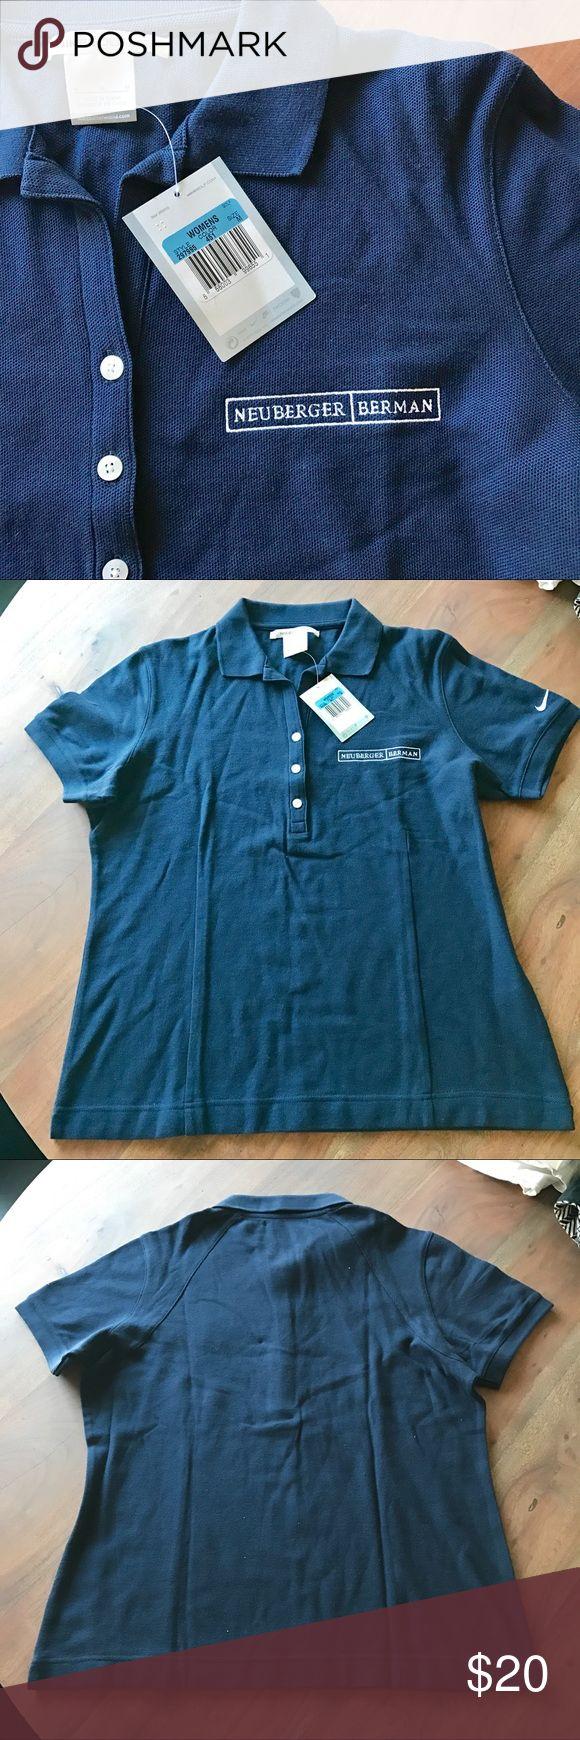 NWT Nike Golf Polo Shirt Brand new never worn, branded navy blue golf polo. 100% cotton. Nike Tops